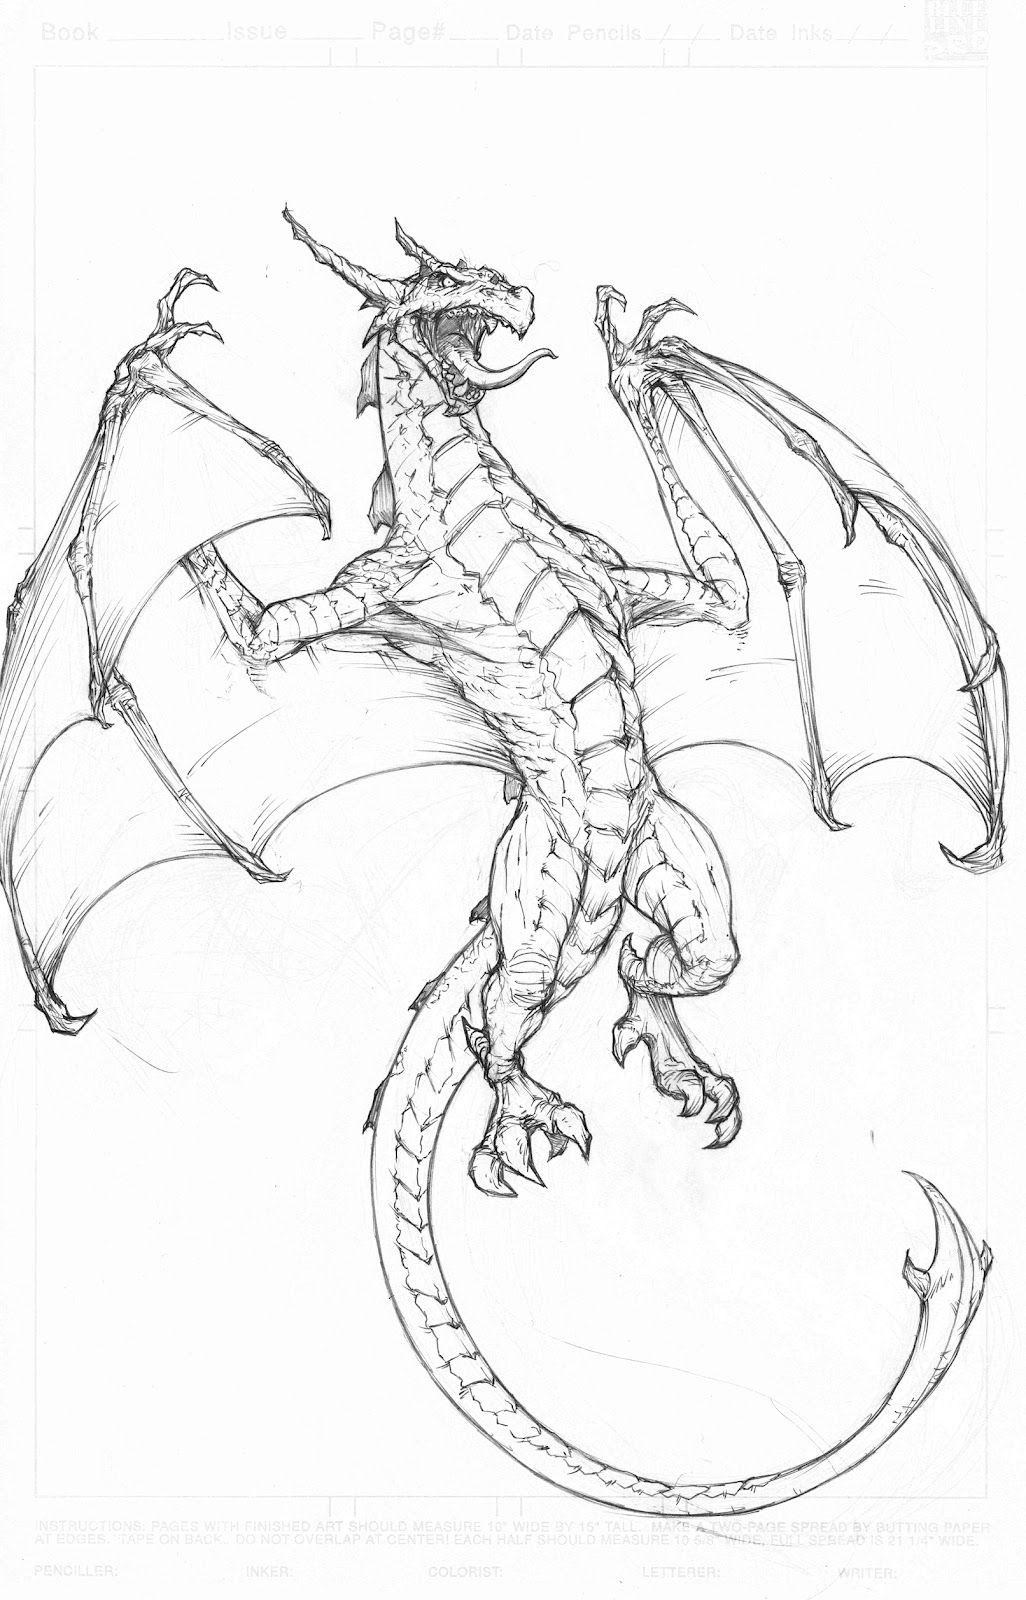 Amazing Drawings Of Dragons Bing Images Dragon Coloring Page Dragon Drawing Dragon Artwork